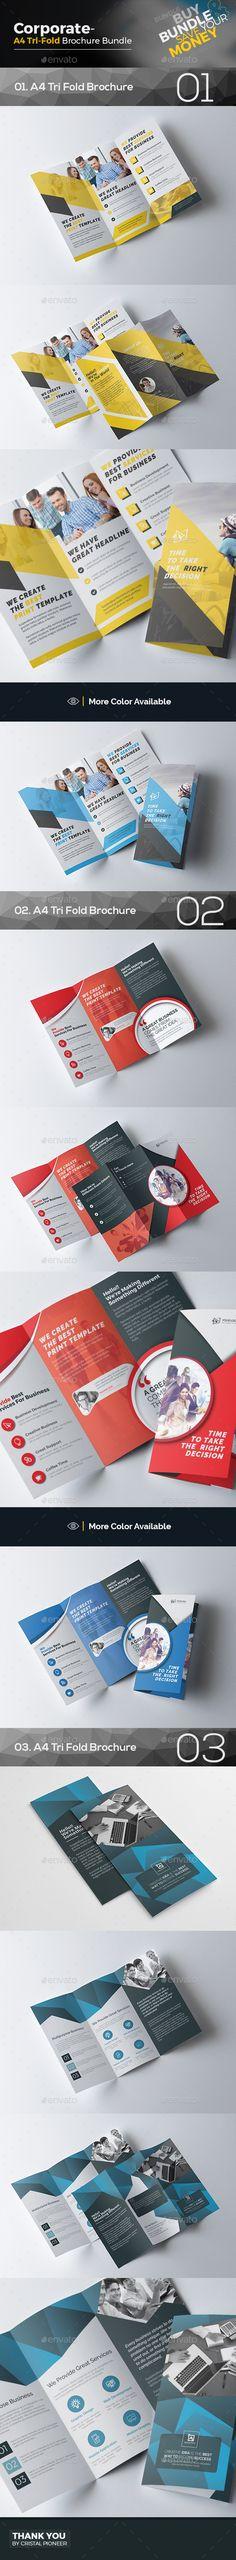 Tri Fold Brochure Bundle Templates Vector EPS, AI Illustrator. Download here: https://graphicriver.net/item/tri-fold-brochure-bundle-3-in-1/17617295?ref=ksioks